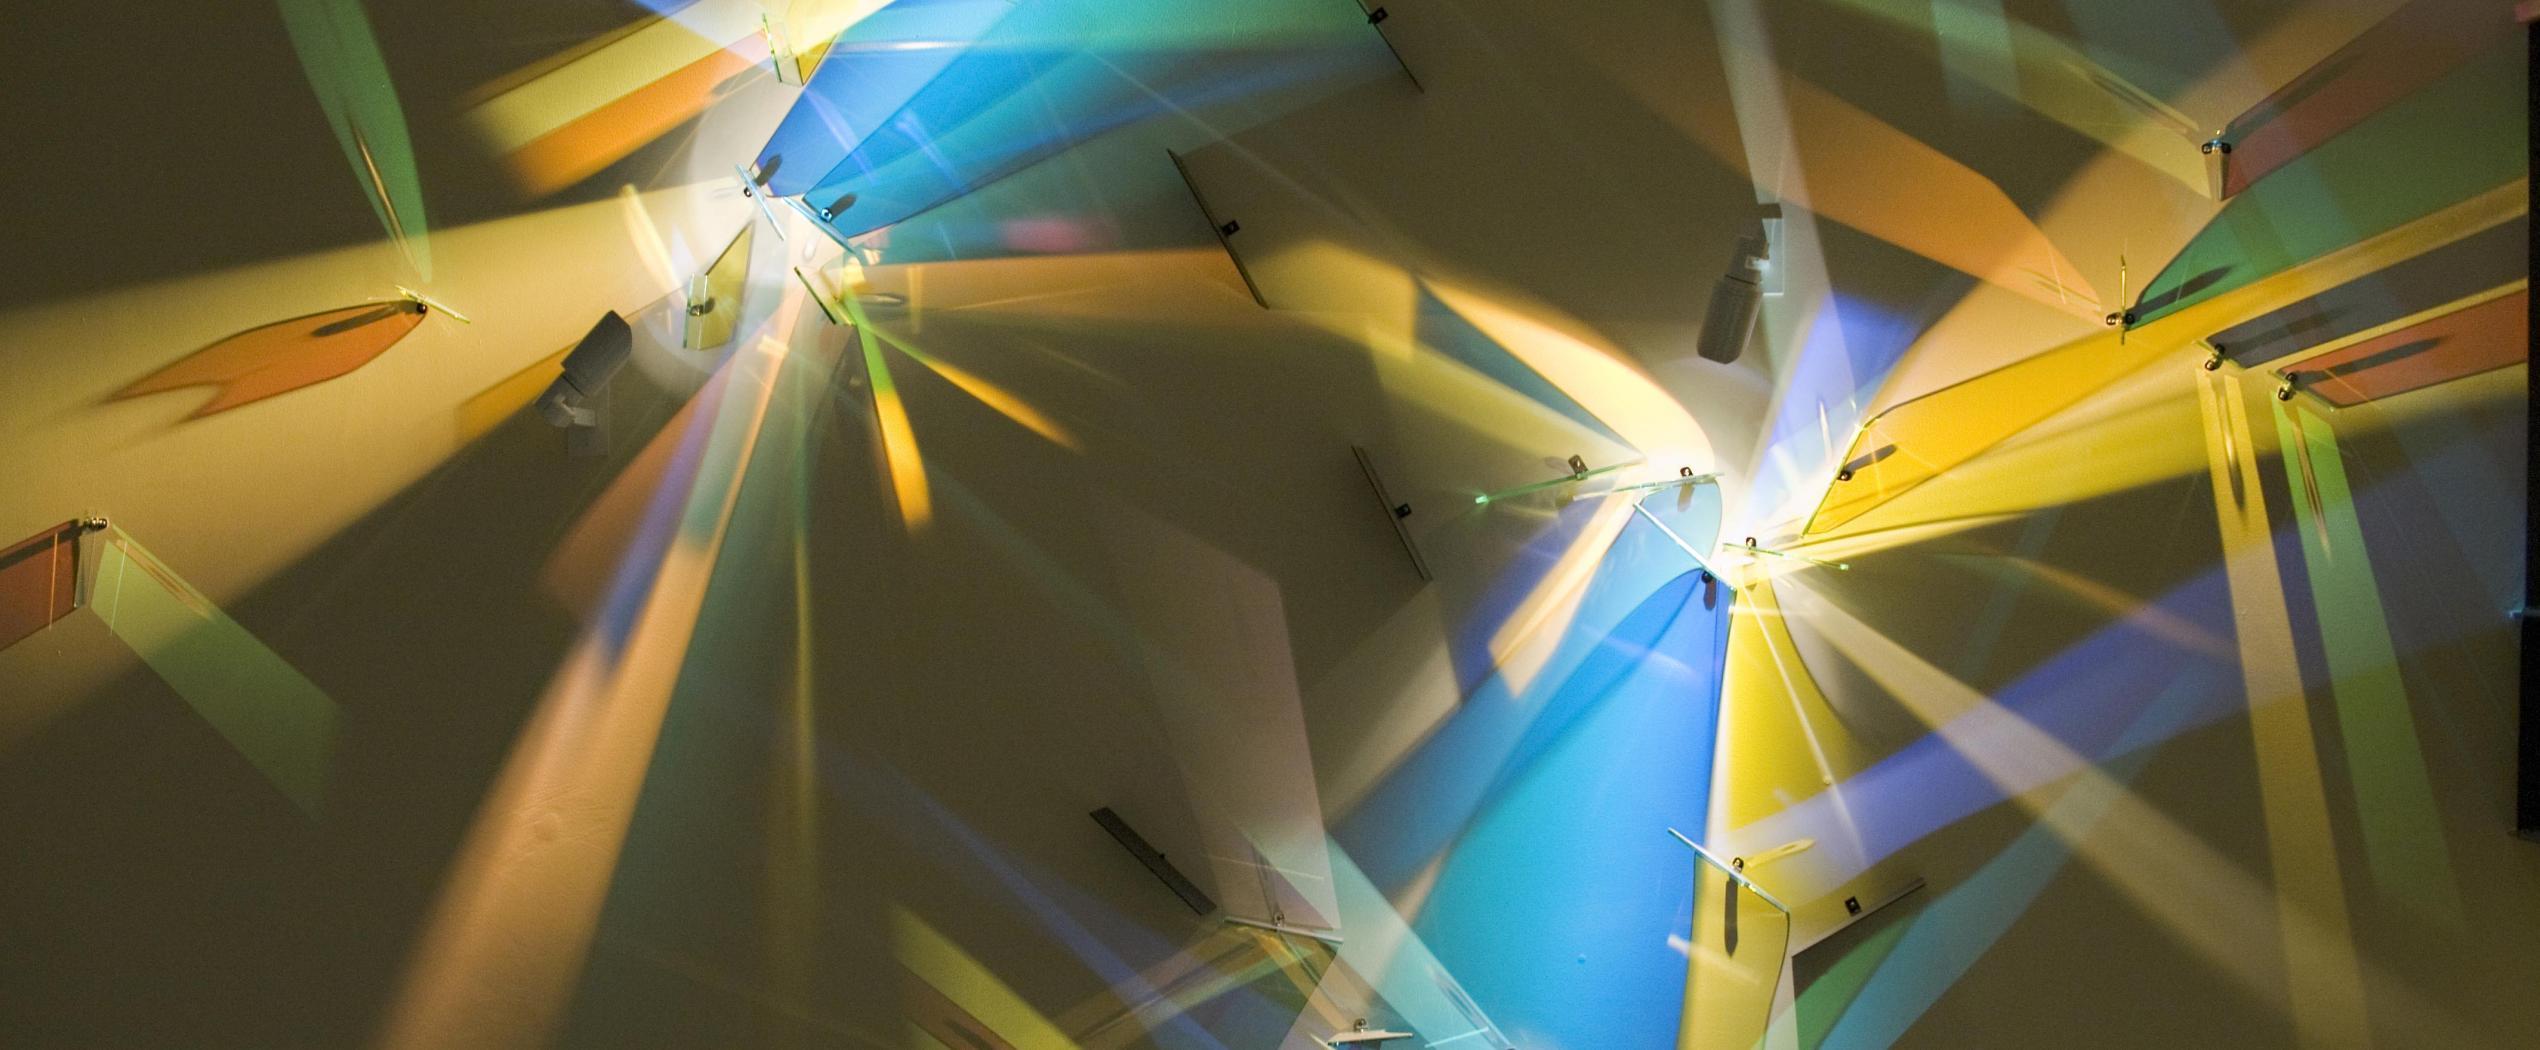 Glass art piece reflecting light from wall